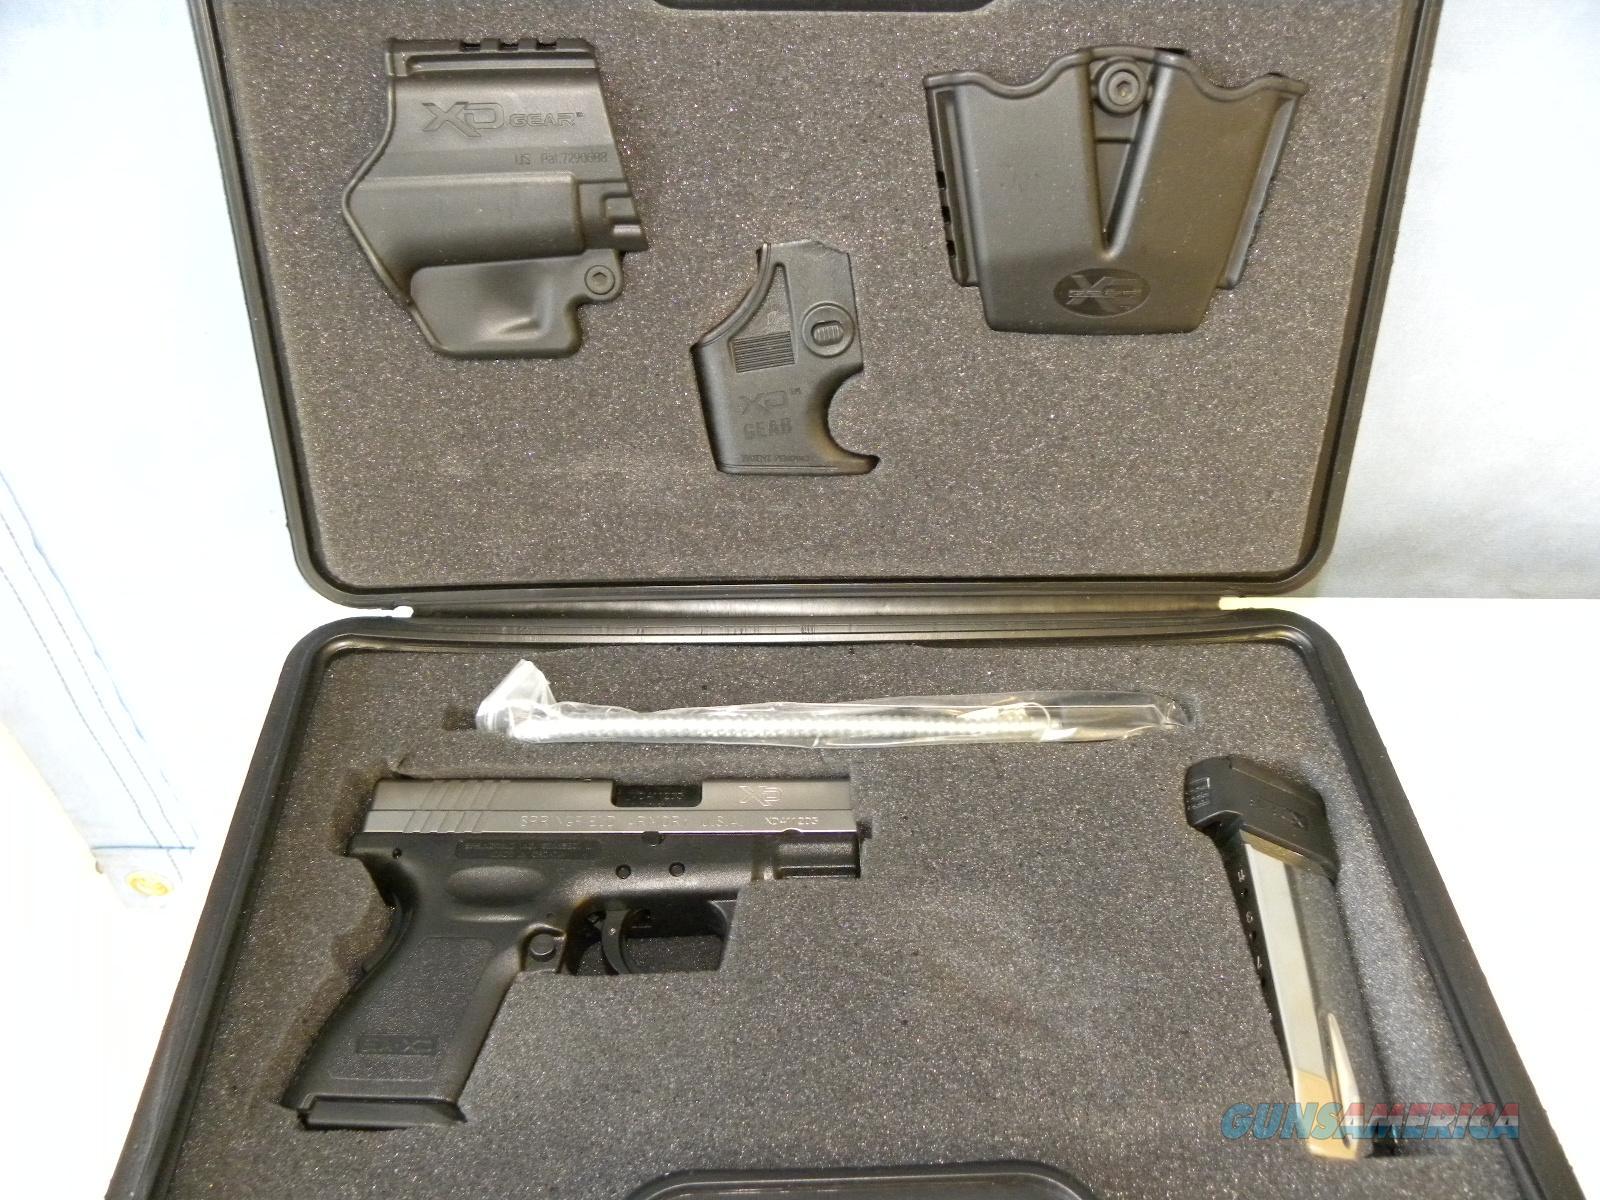 Springfield XD-40 Sub Compact SS  Guns > Pistols > Springfield Armory Pistols > XD (eXtreme Duty)